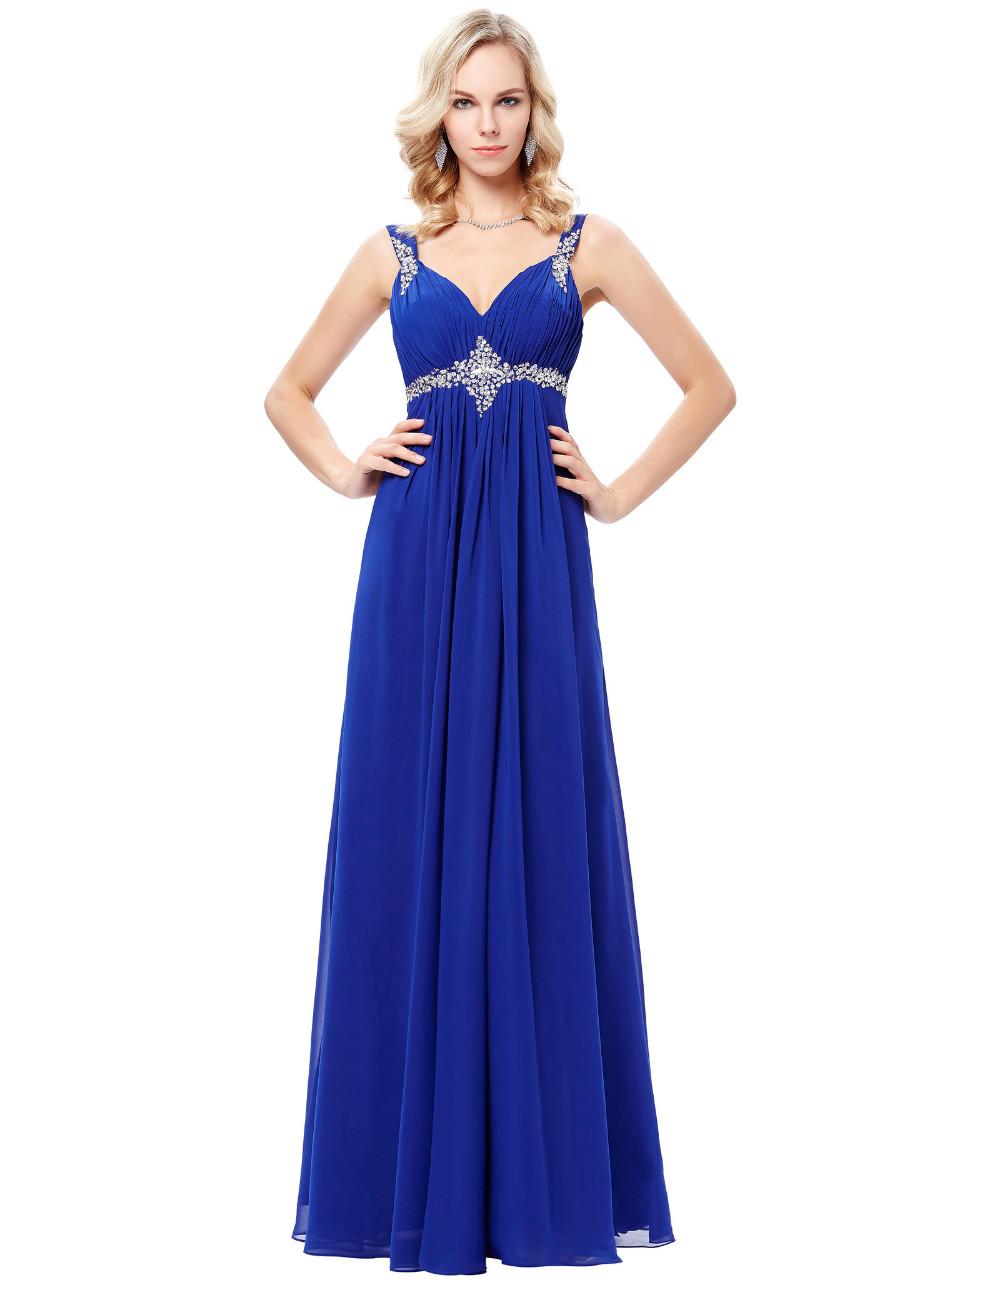 HTB1E33wOFXXXXXVXXXXq6xXFXXXOLong Formal Dress Elegant Floor Length Chiffon Dress